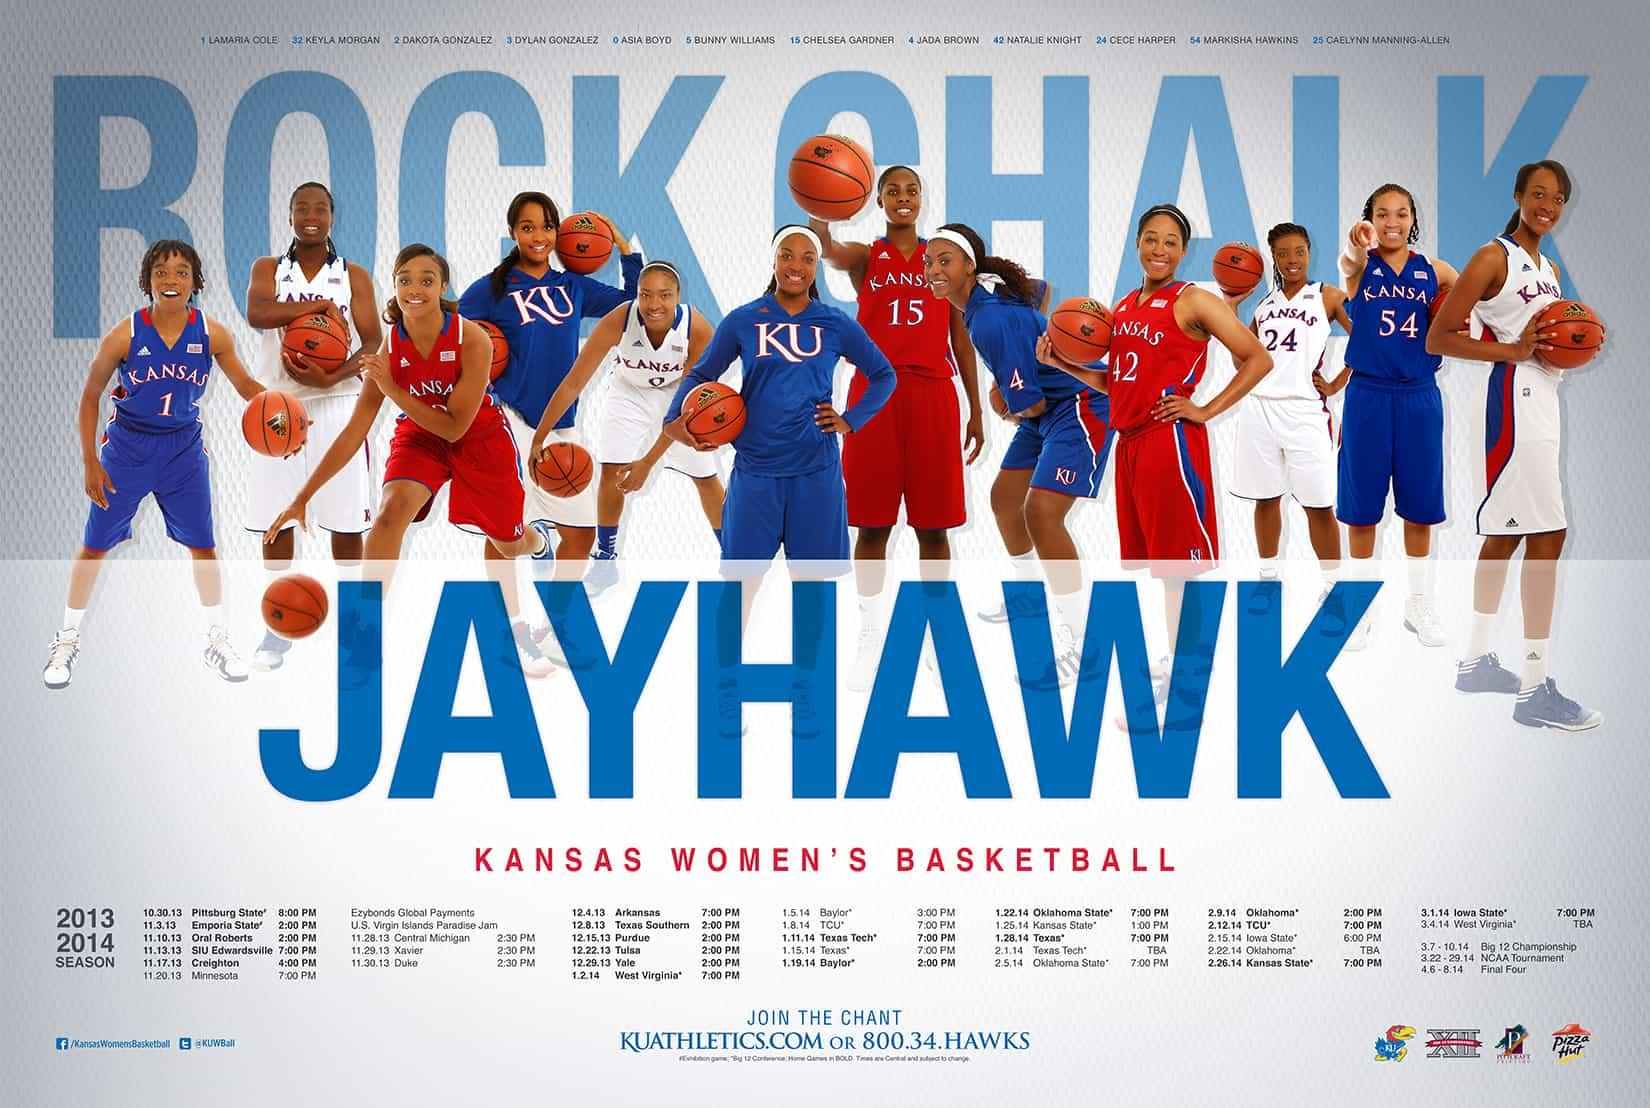 image regarding Ku Basketball Schedule Printable named Ku Oklahoma Basketball Rating All Basketball Ratings Information and facts